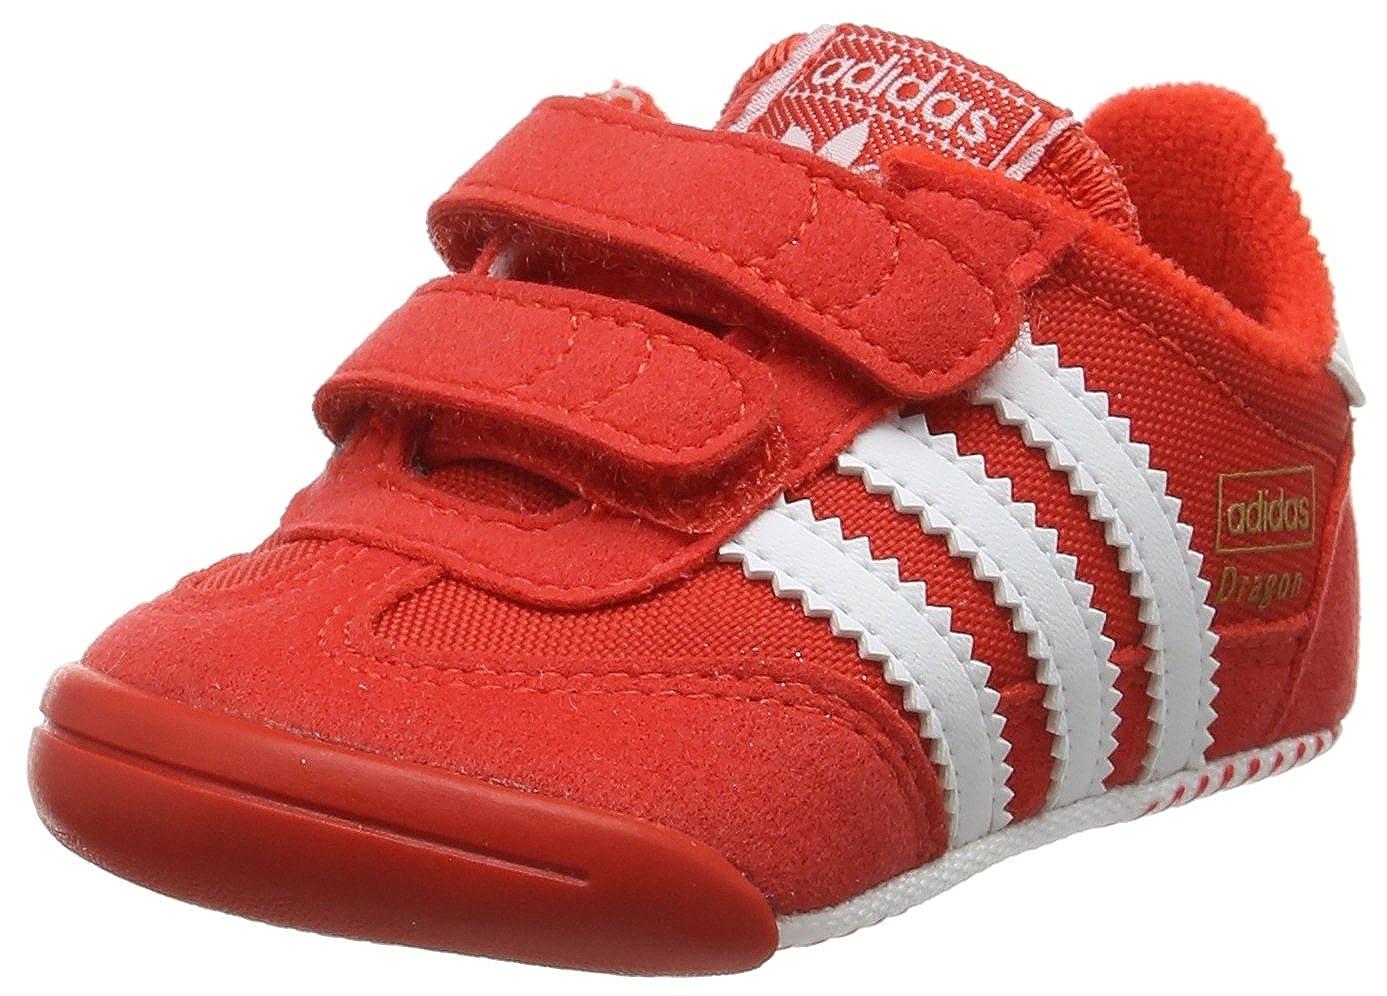 adidas Unisex Babies' Dragon L2w Crib Sneakers adidas Unisex Babies' Dragon L2w Crib Sneakers